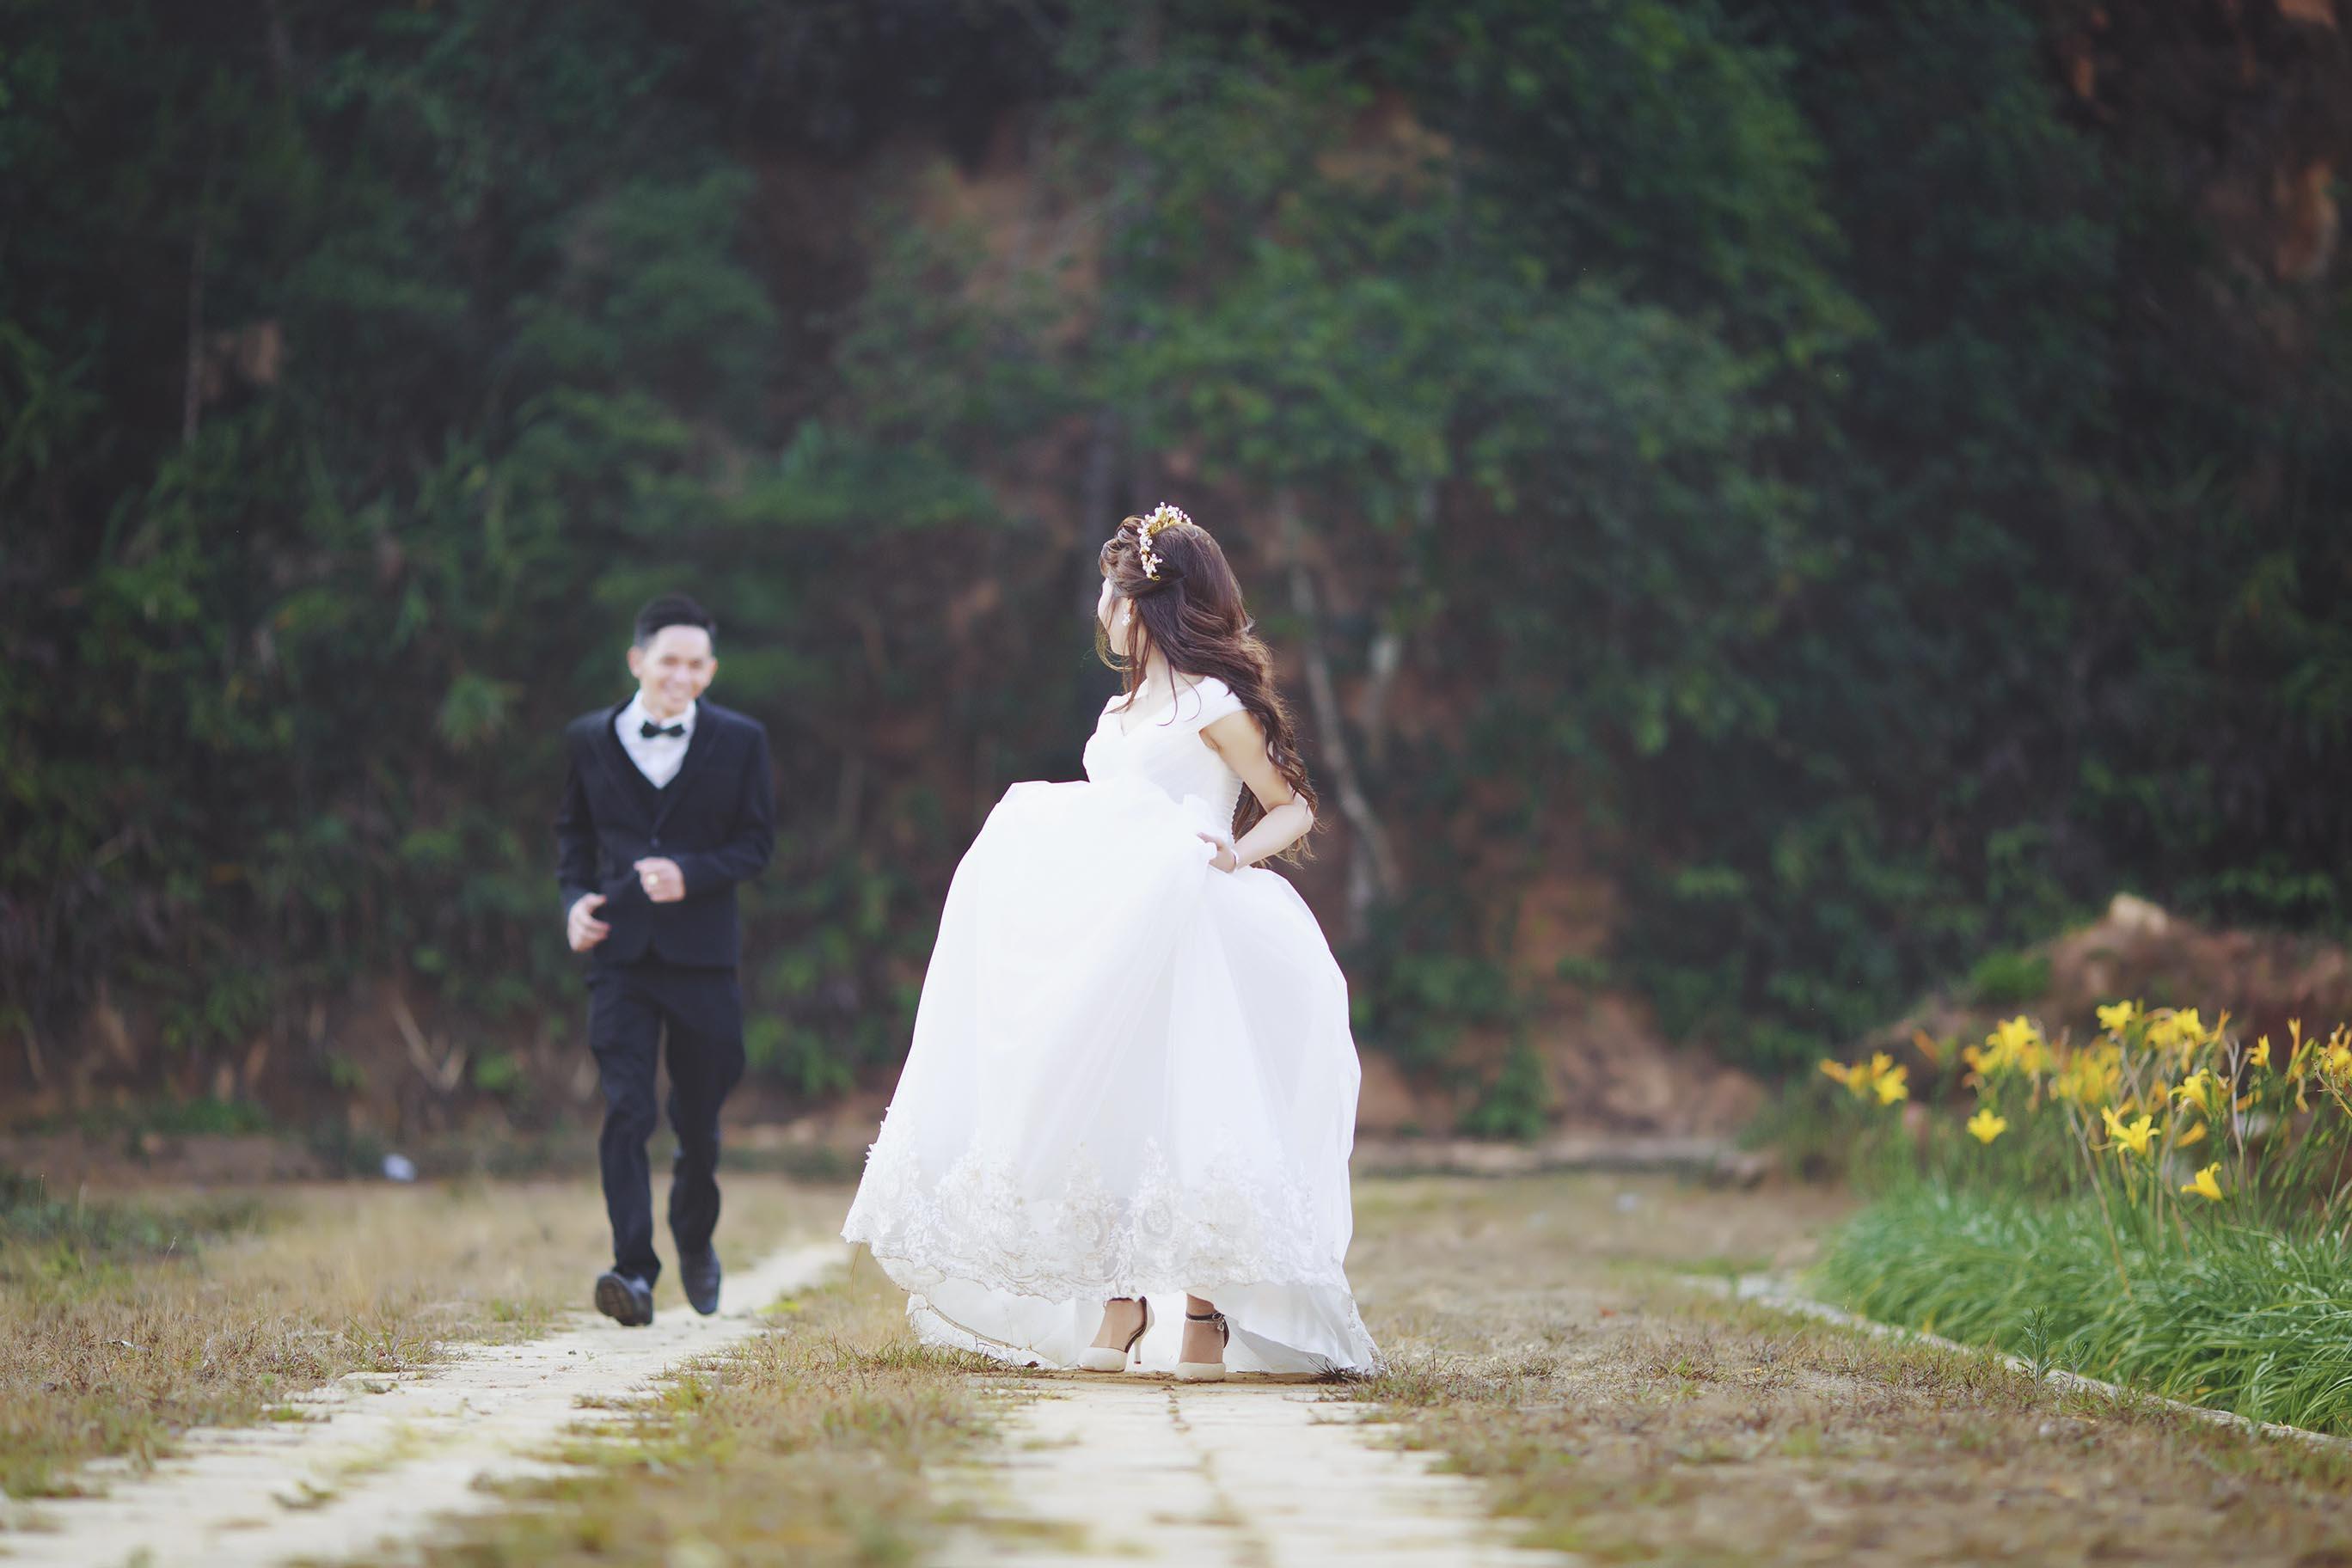 alohastudio-wedding-dia-chi-studio-chup-hinh-cuoi-dep-tai-tp-hcm-15